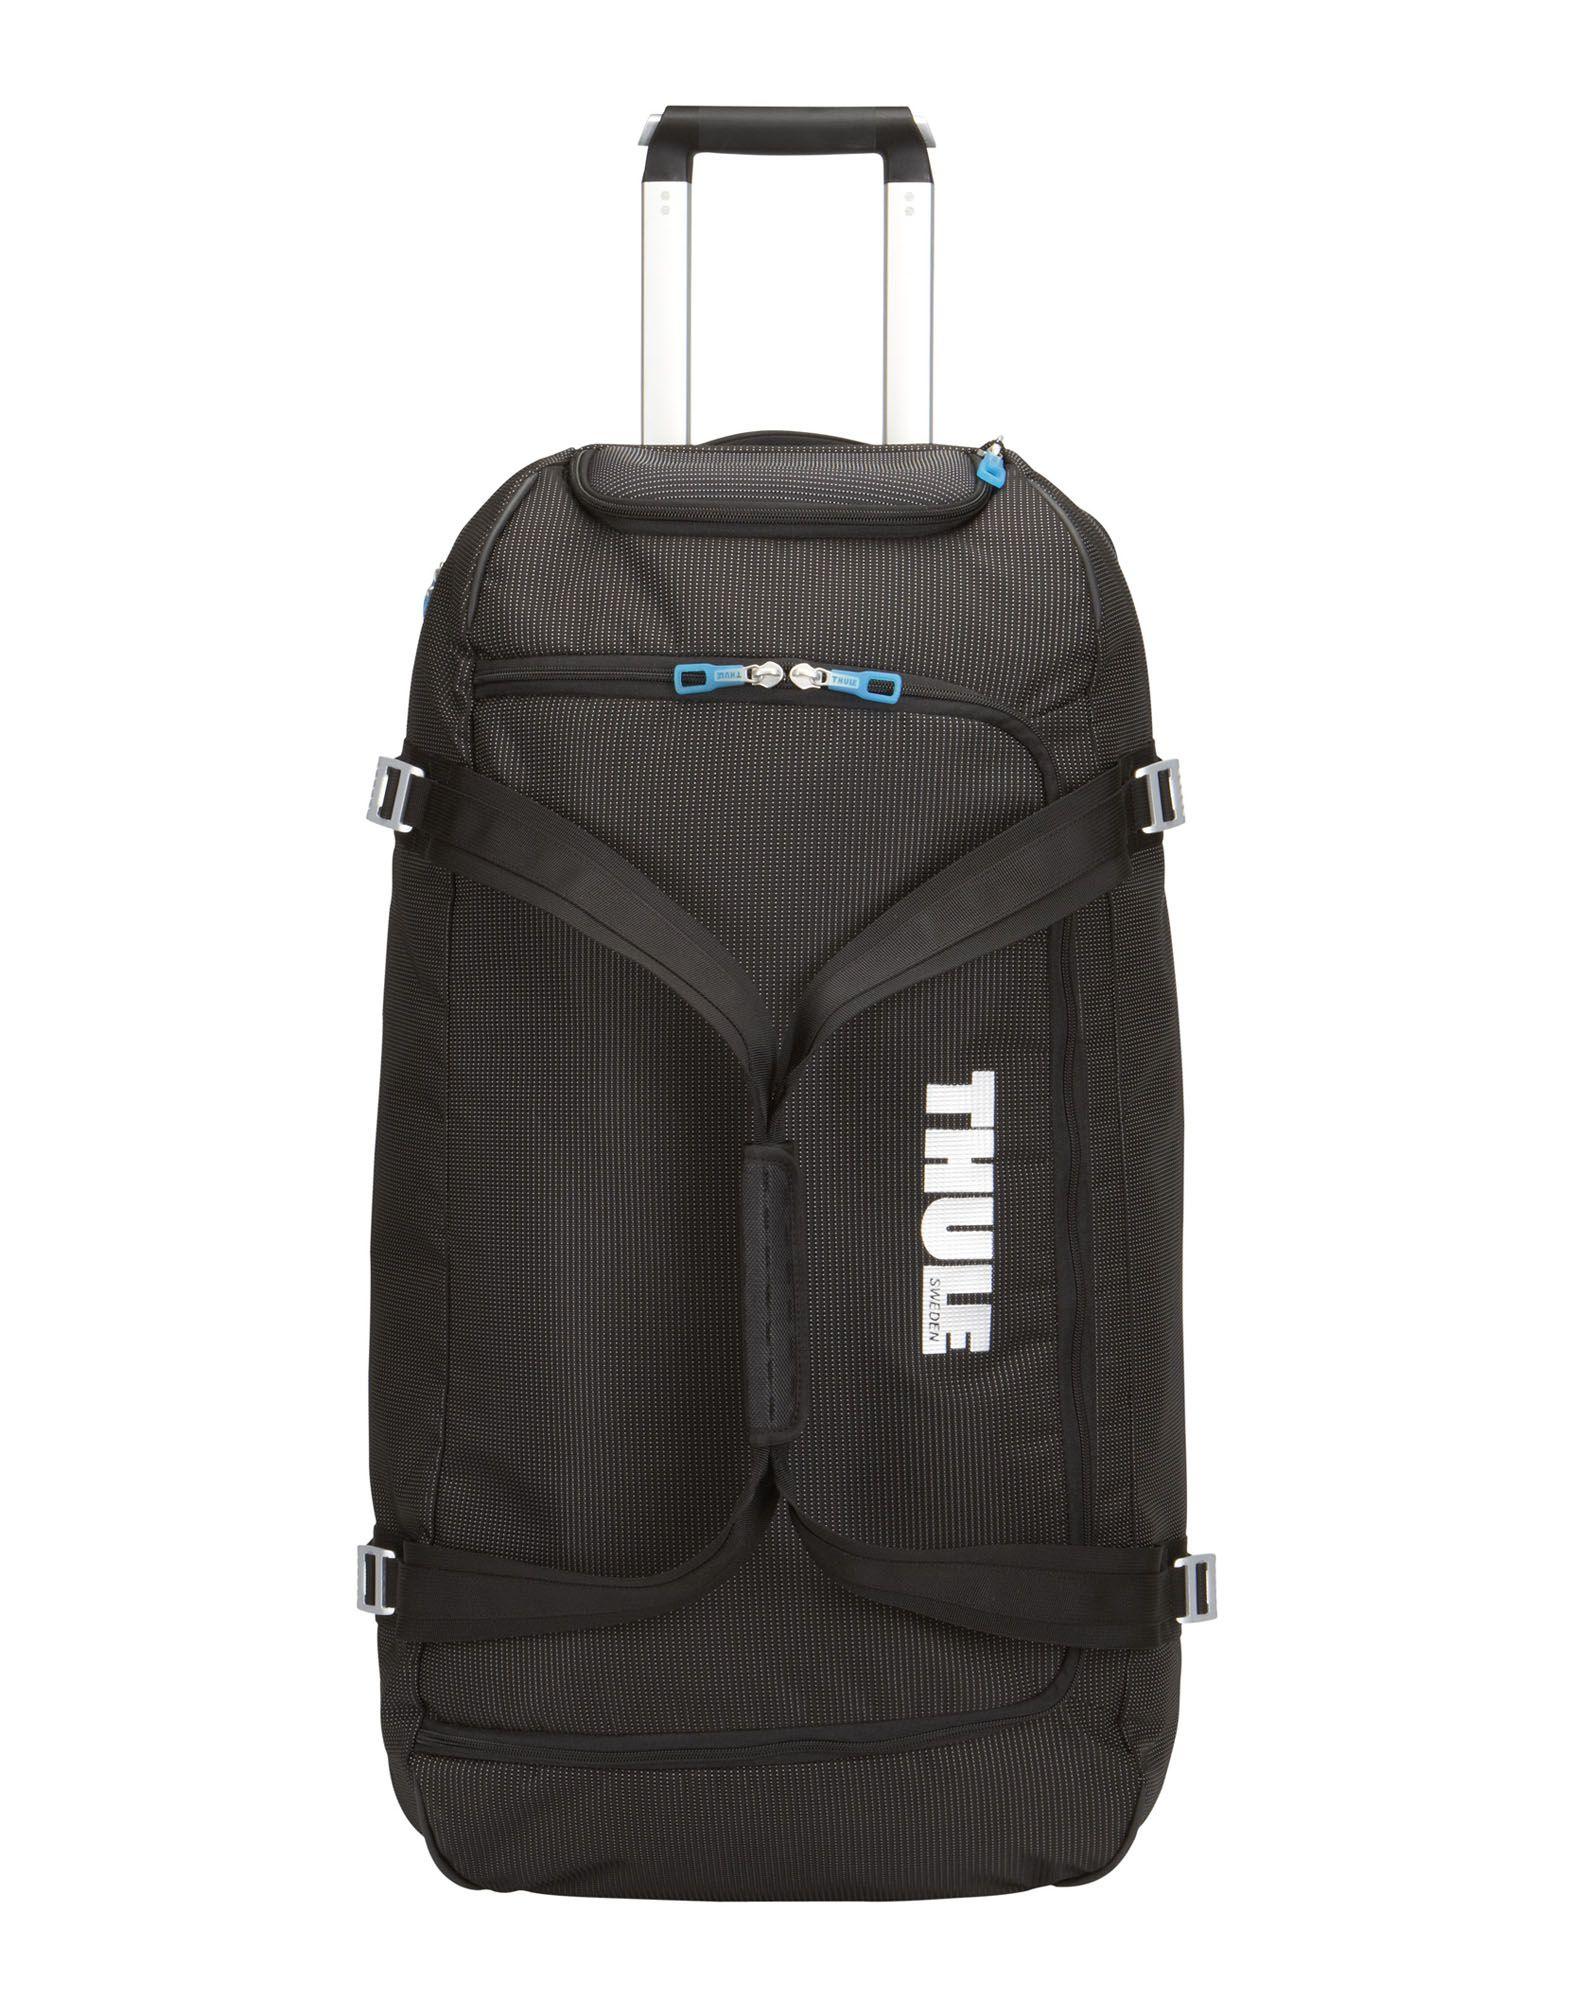 THULE® Чемодан/сумка на колесиках автобагажник для перевозки лодок thule артикул 874